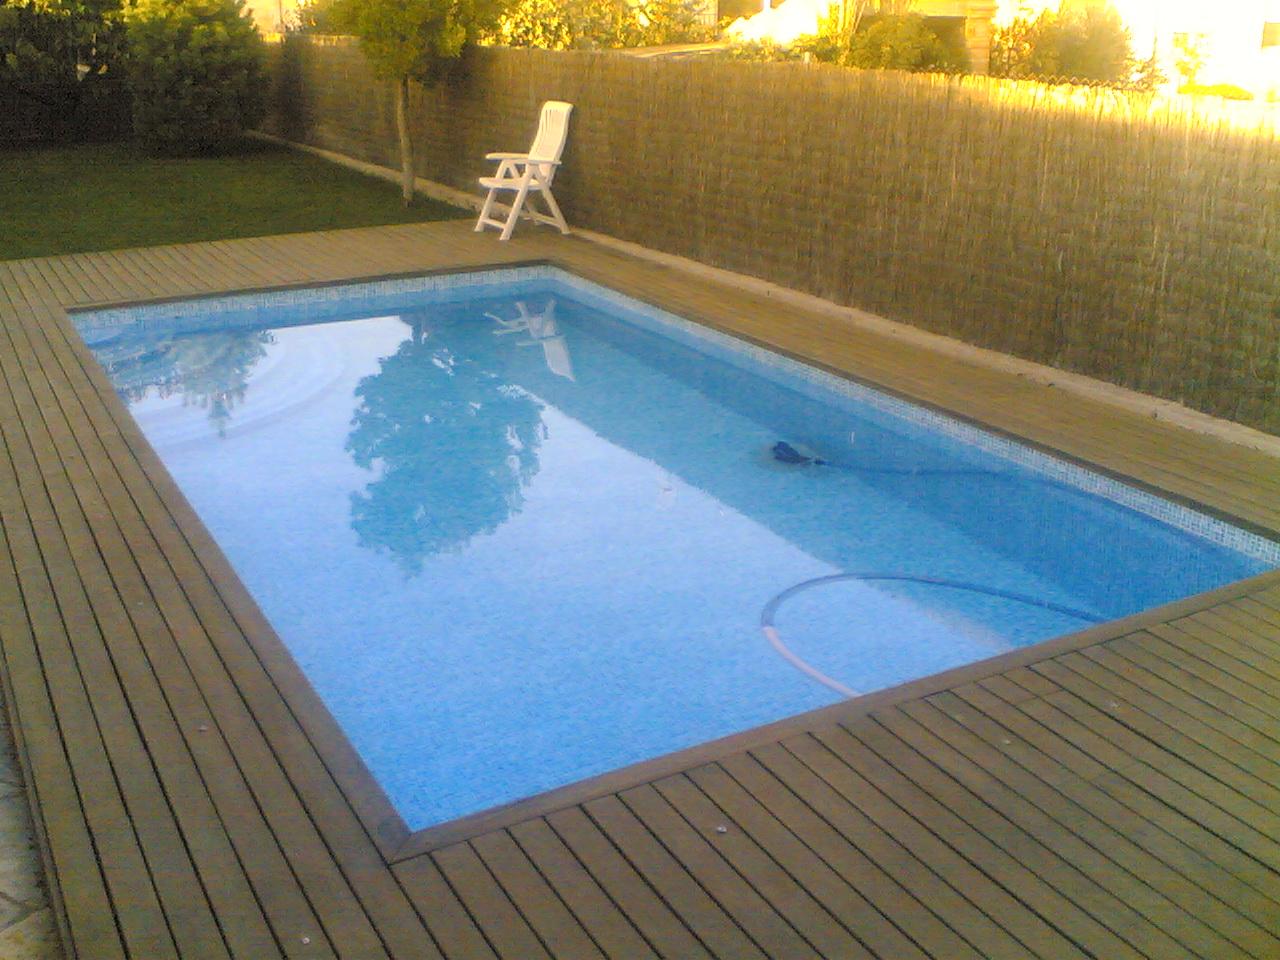 Piscinas de poliester codetrac s l expertos en piscinas for Piscinas obra